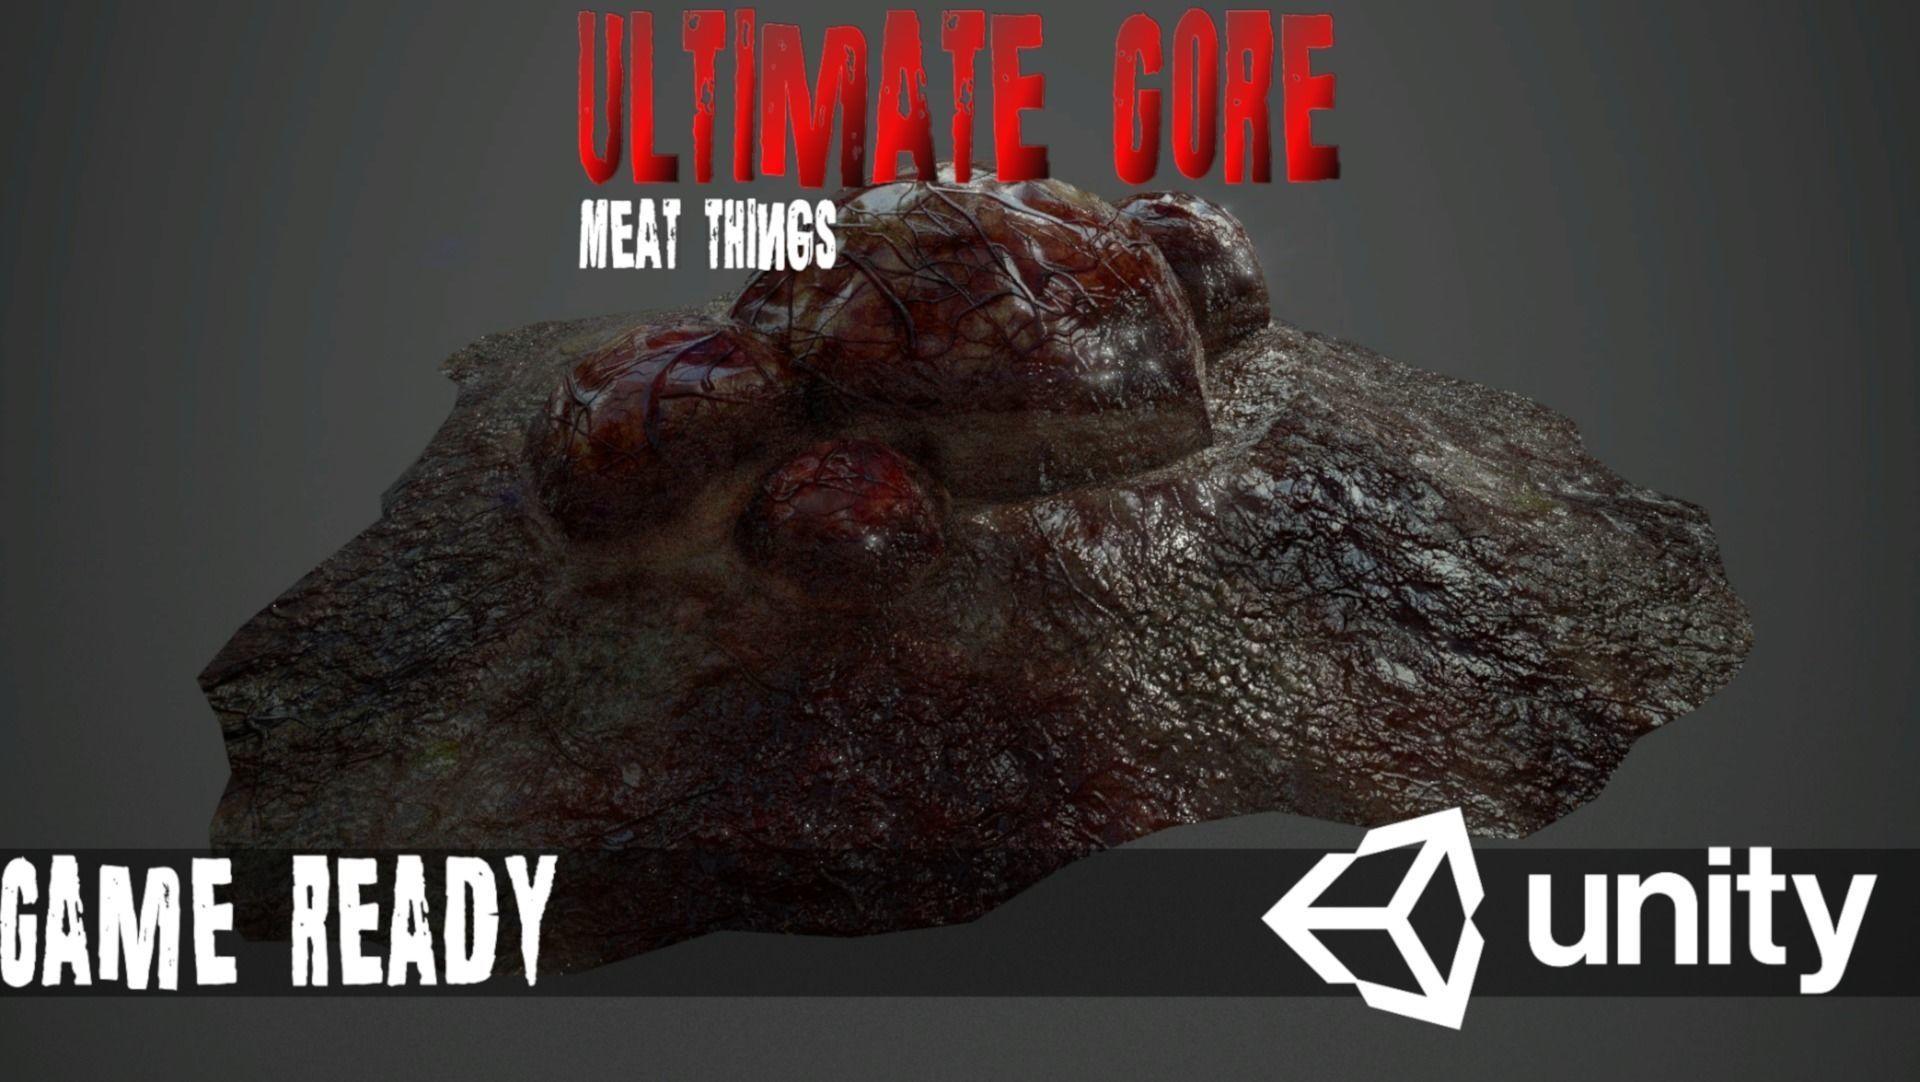 Ultimate Gore - PBR MeatThings